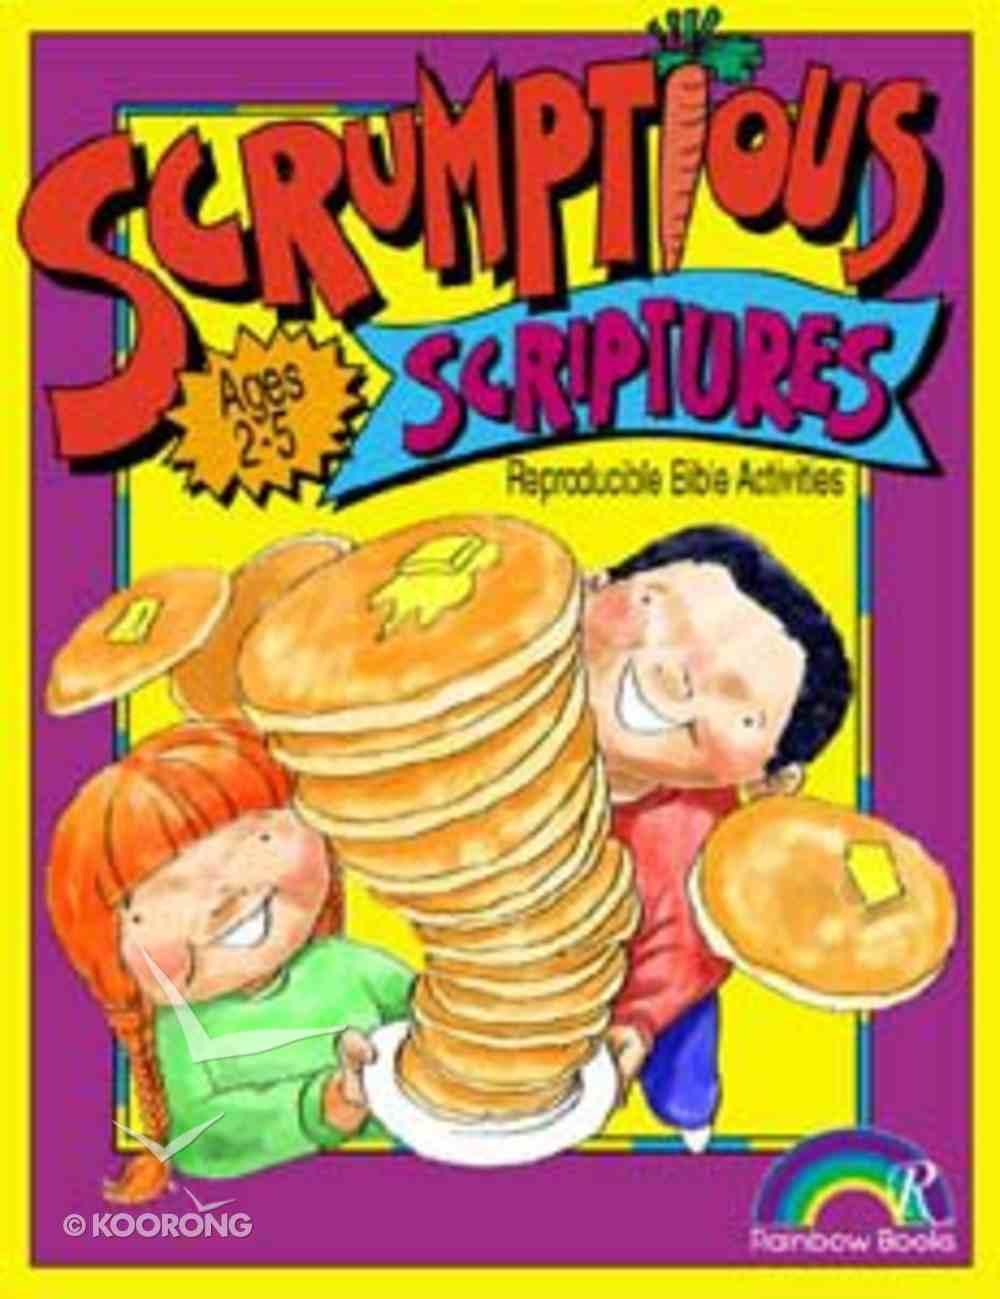 Scrumptious Scriptures: Ages 2-5 (Reproducible) Paperback